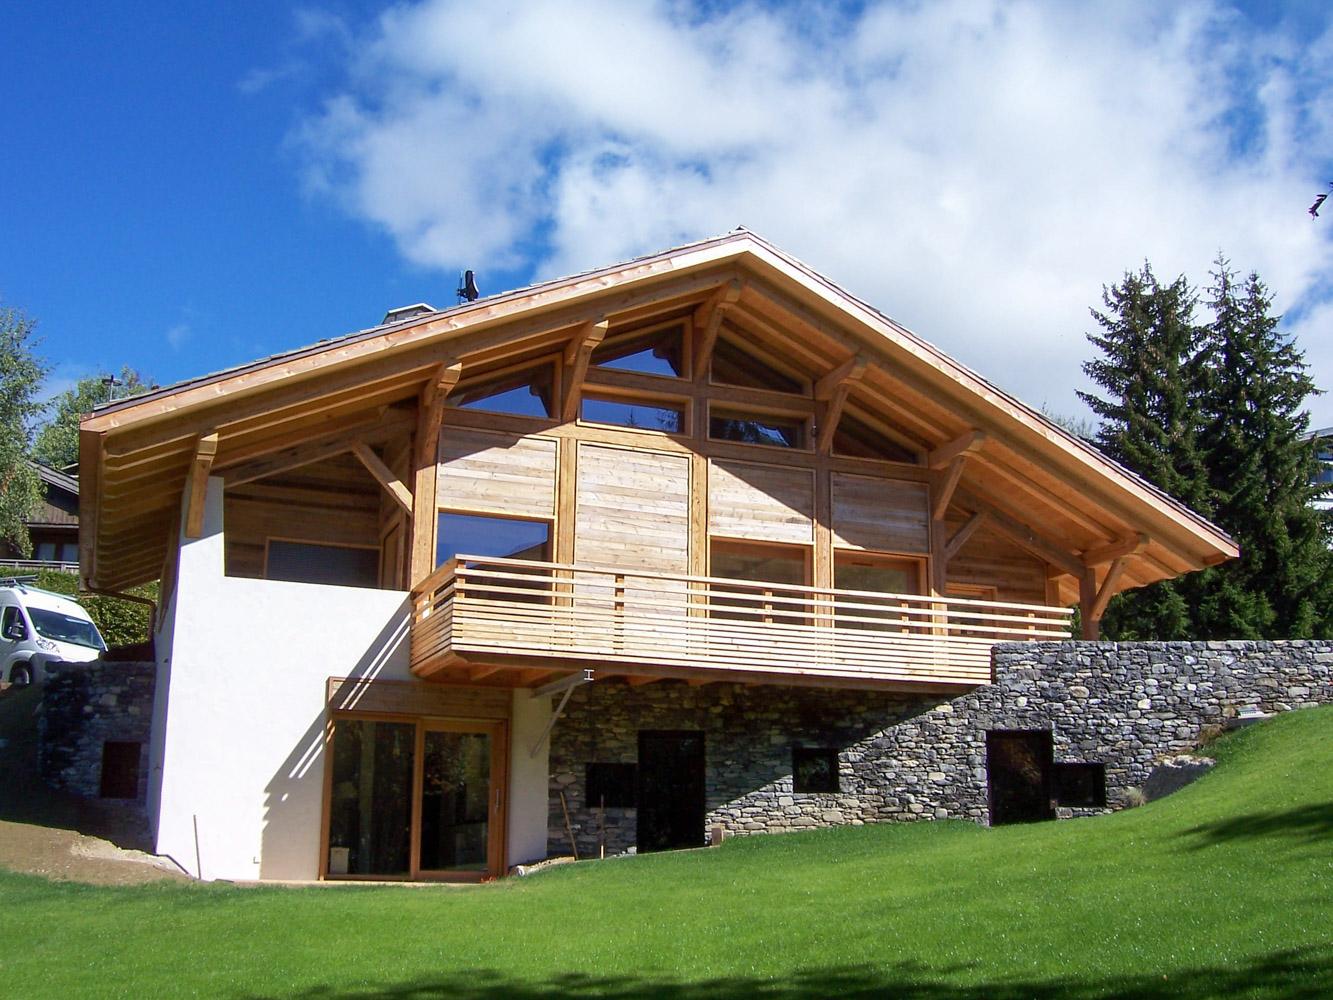 charpente bottollier cordon haute savoie 74 charpente bois neuf haute savoie 74. Black Bedroom Furniture Sets. Home Design Ideas